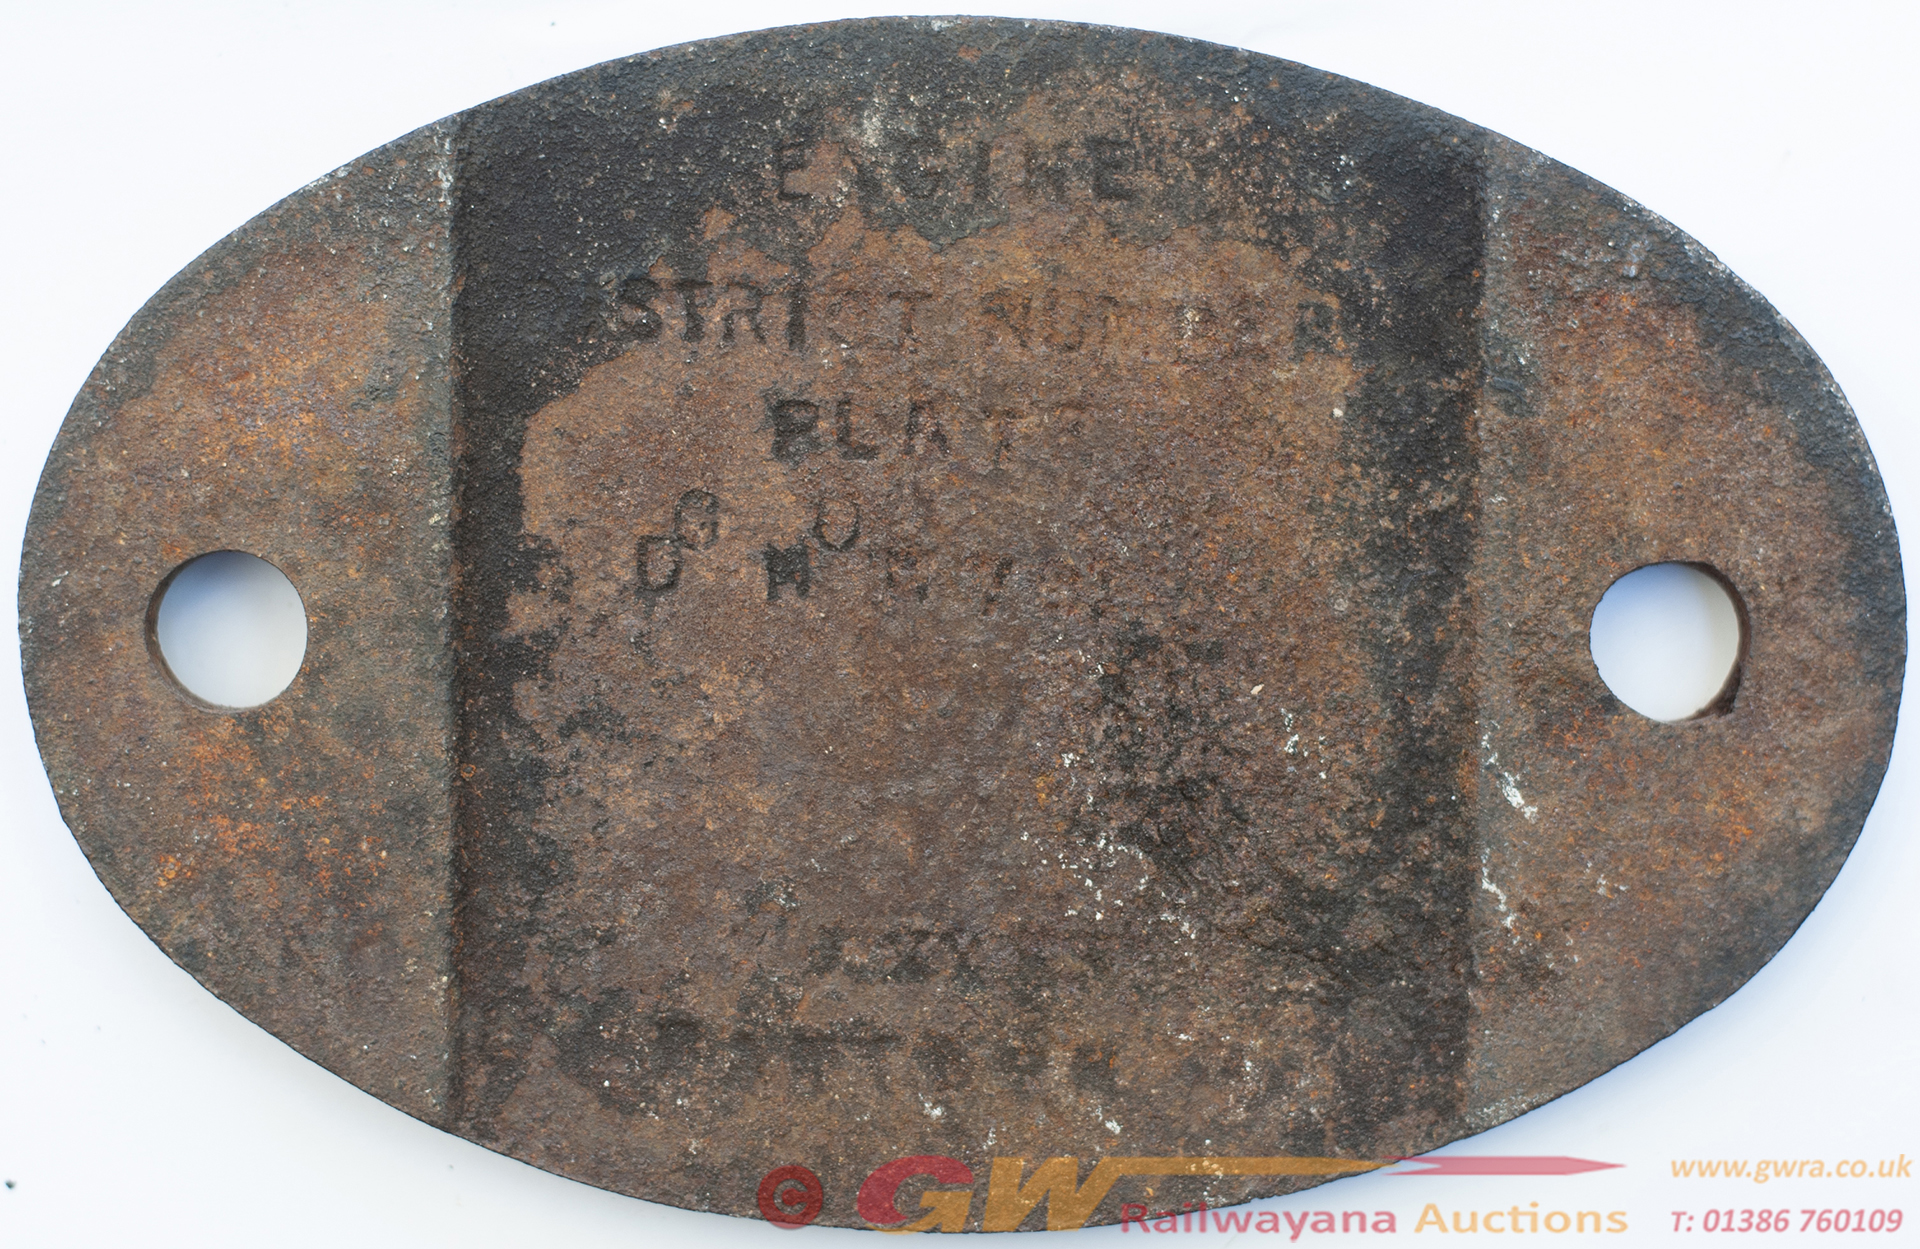 Shedplate 64g Hawick 1950-1966 With Sub Sheds